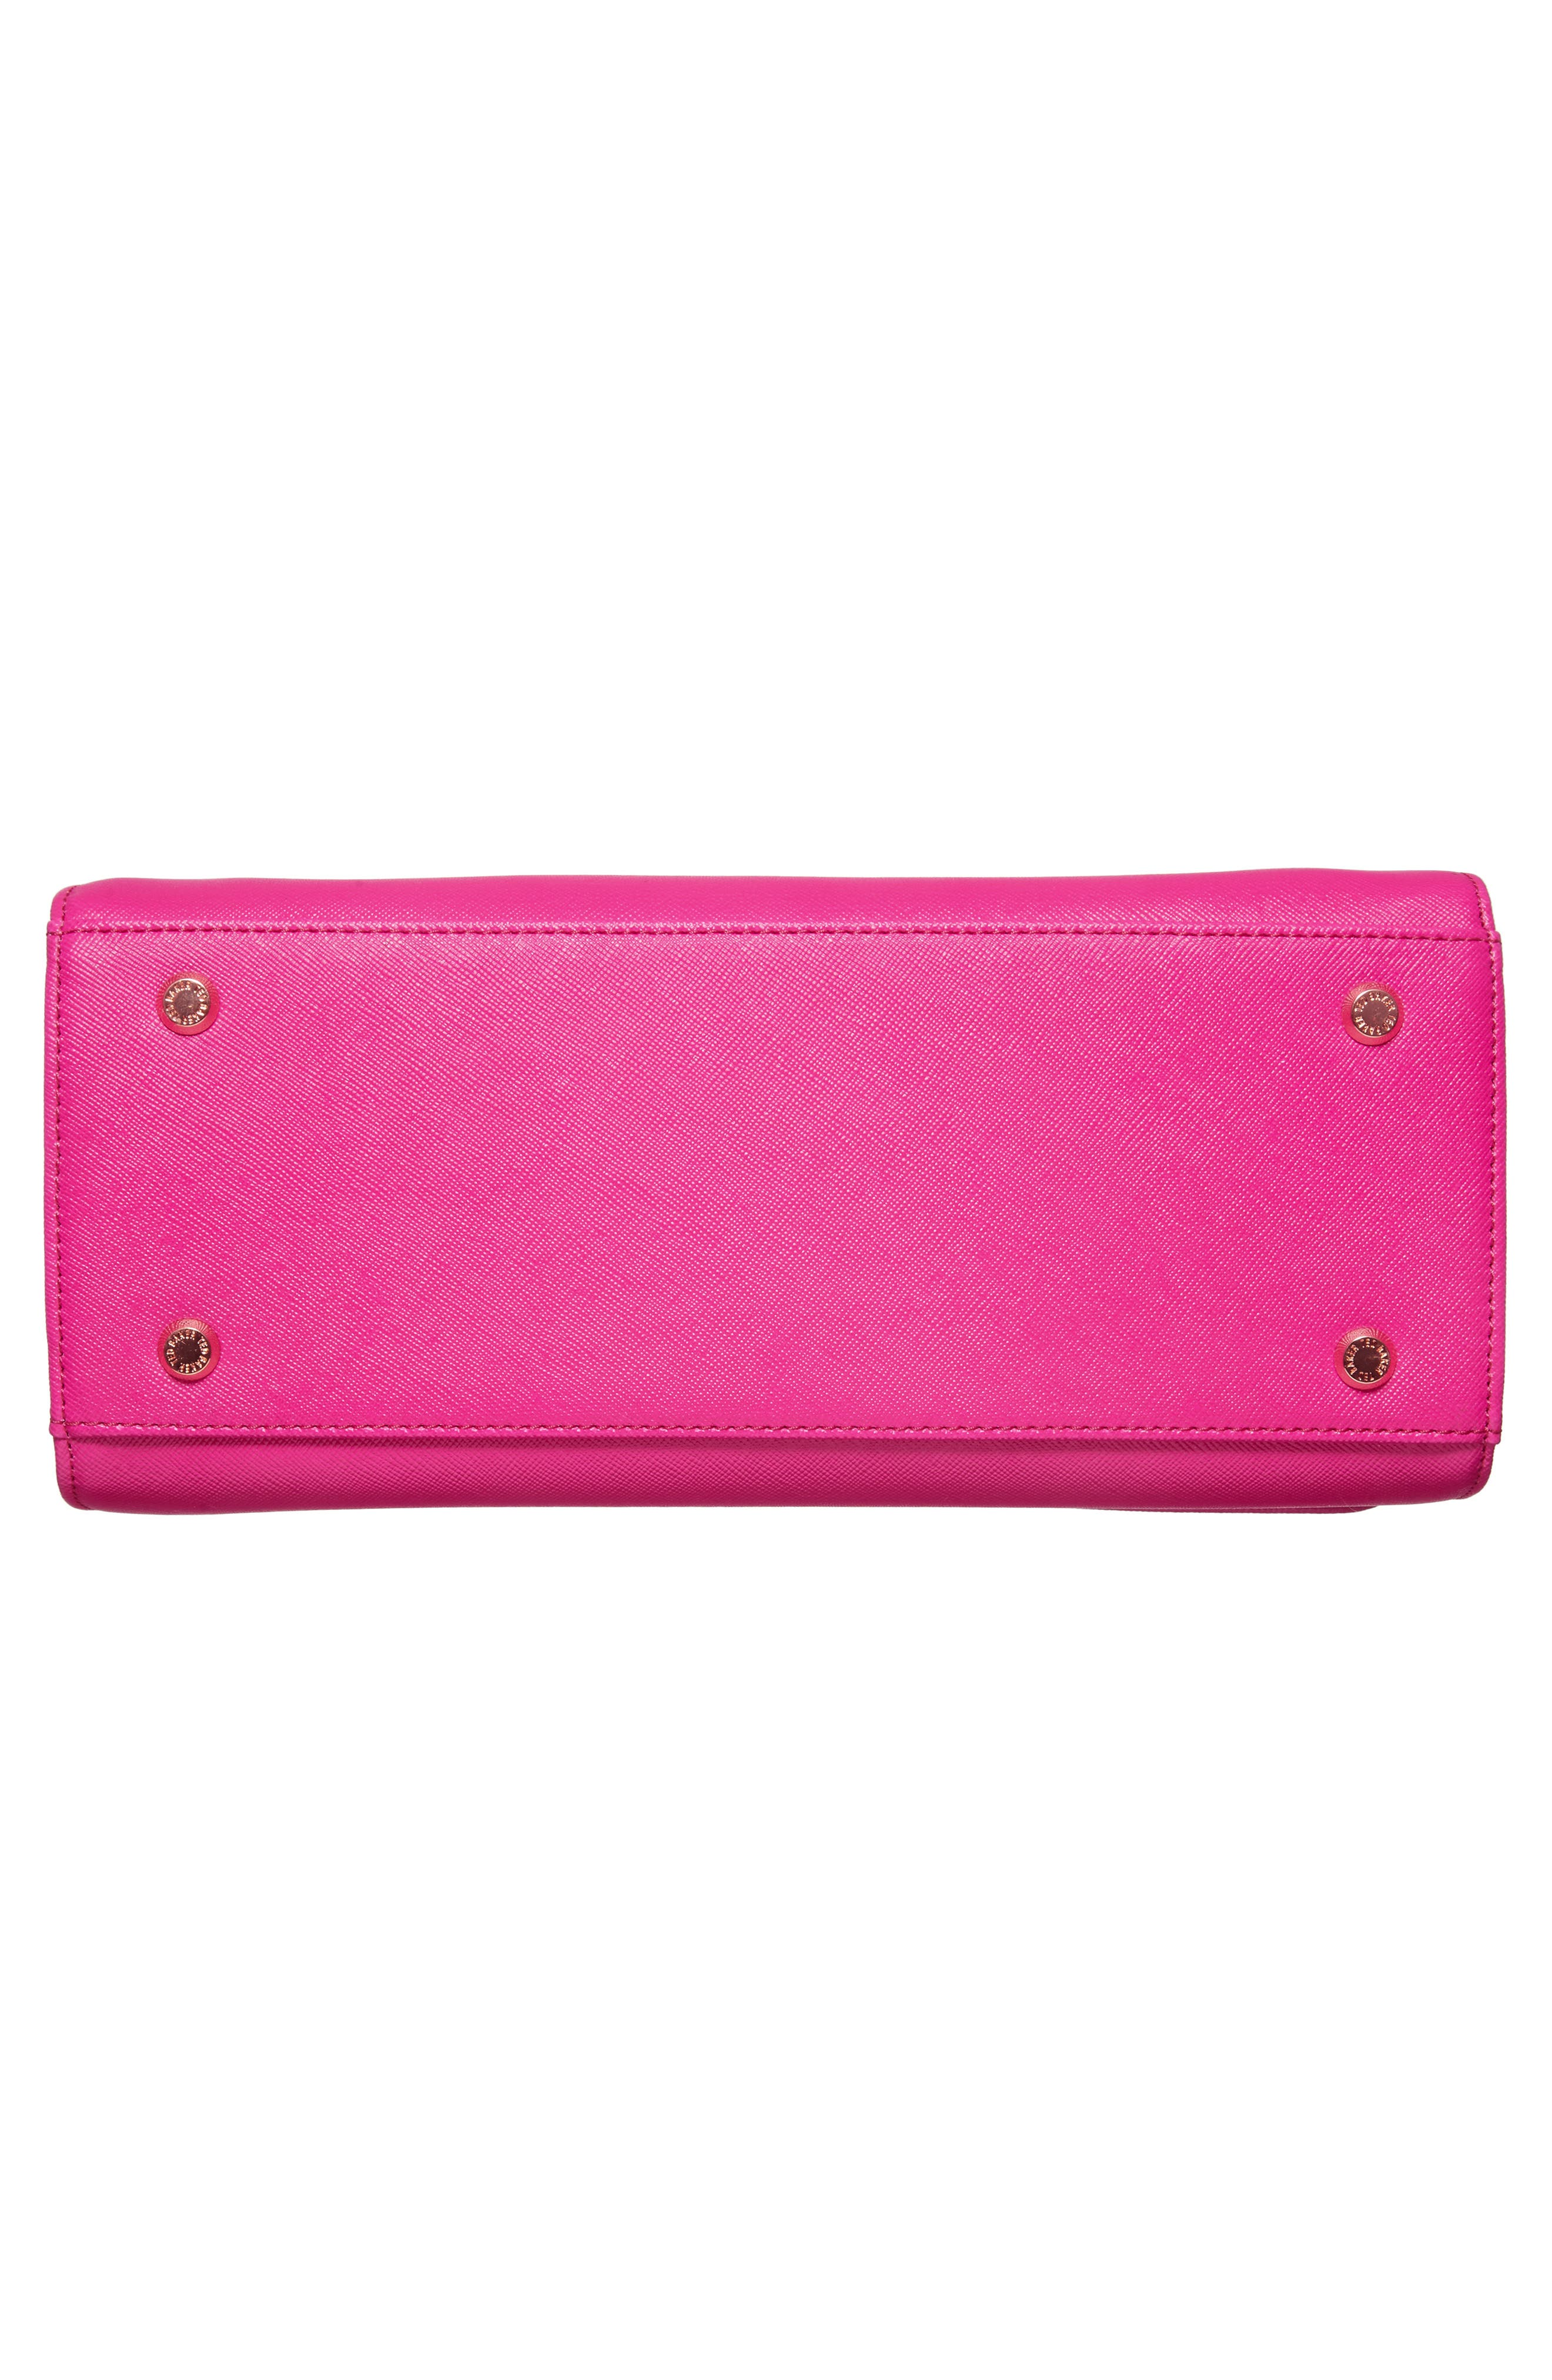 Hetie Faux Leather Satchel,                             Alternate thumbnail 6, color,                             Bright Pink